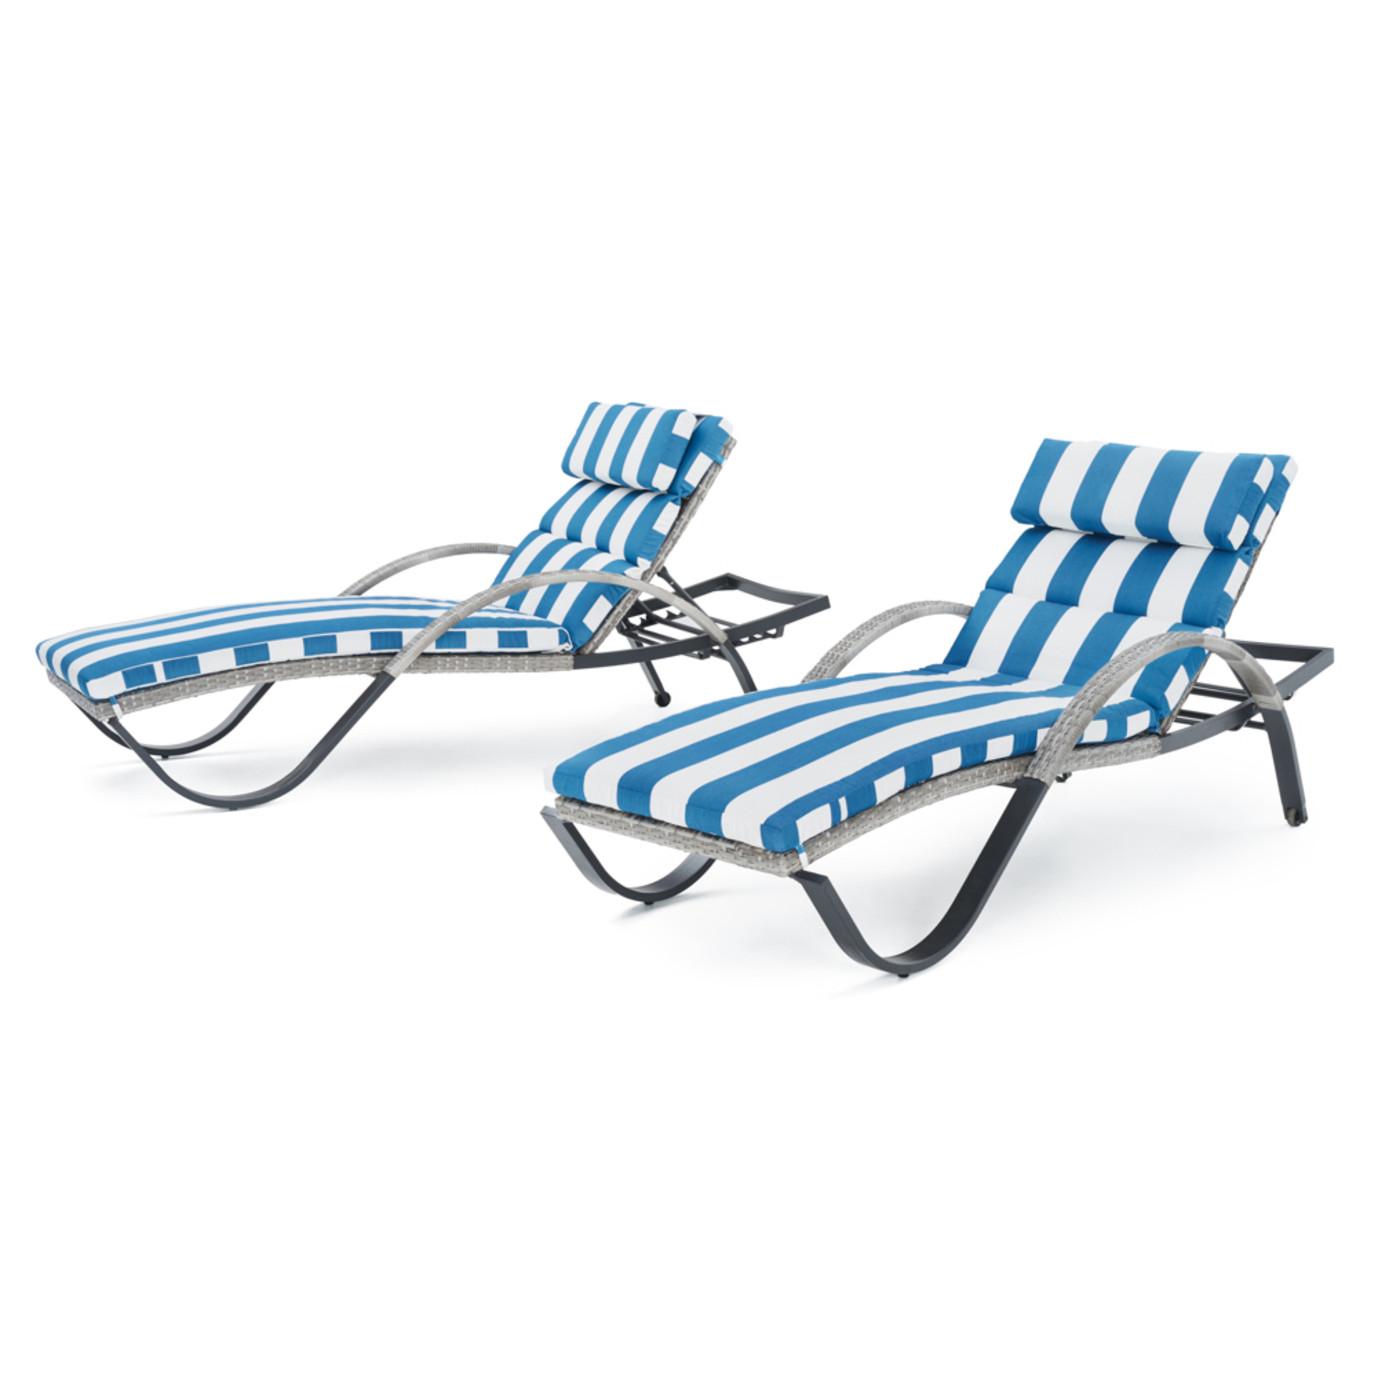 Cannes™ Chaise Lounge 2pk - Regatta Blue